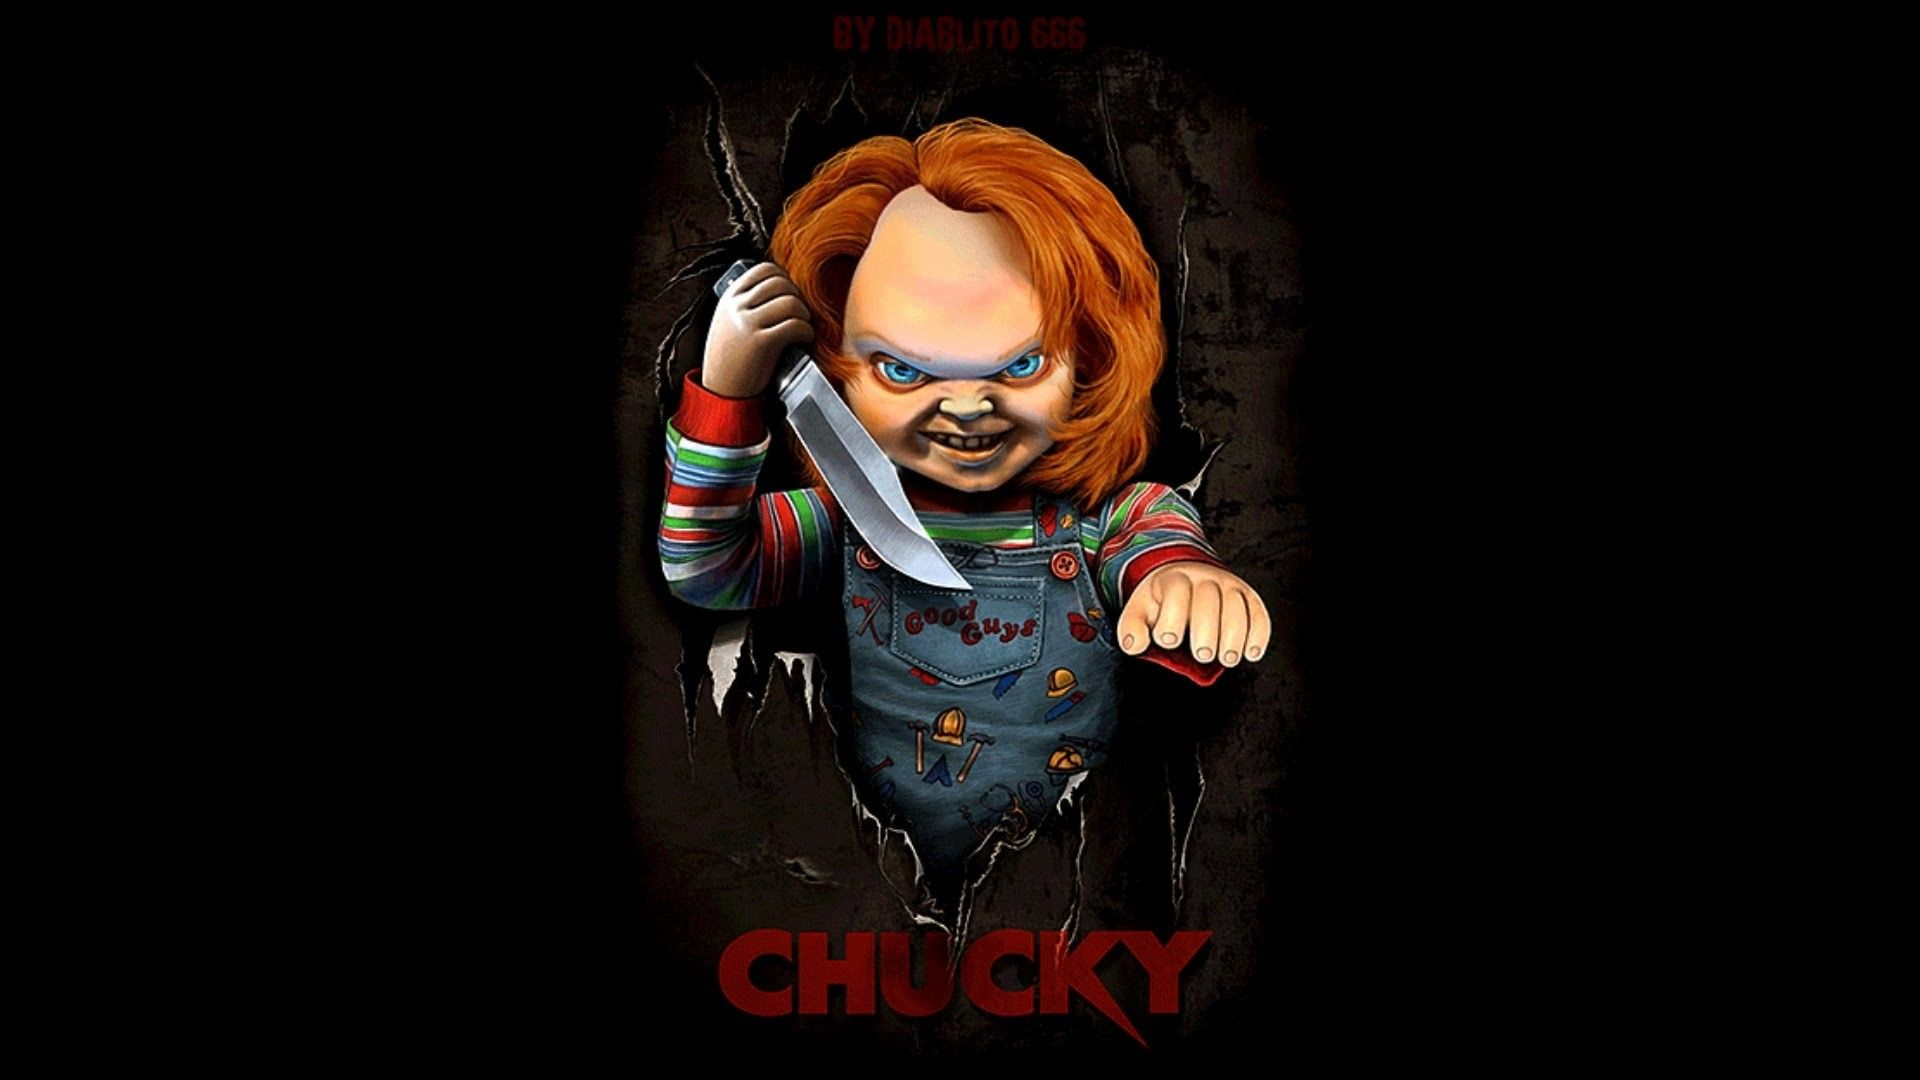 Most Popular Chucky Wallpaper Hd 1920x1080 Chucky Kodi Most Popular